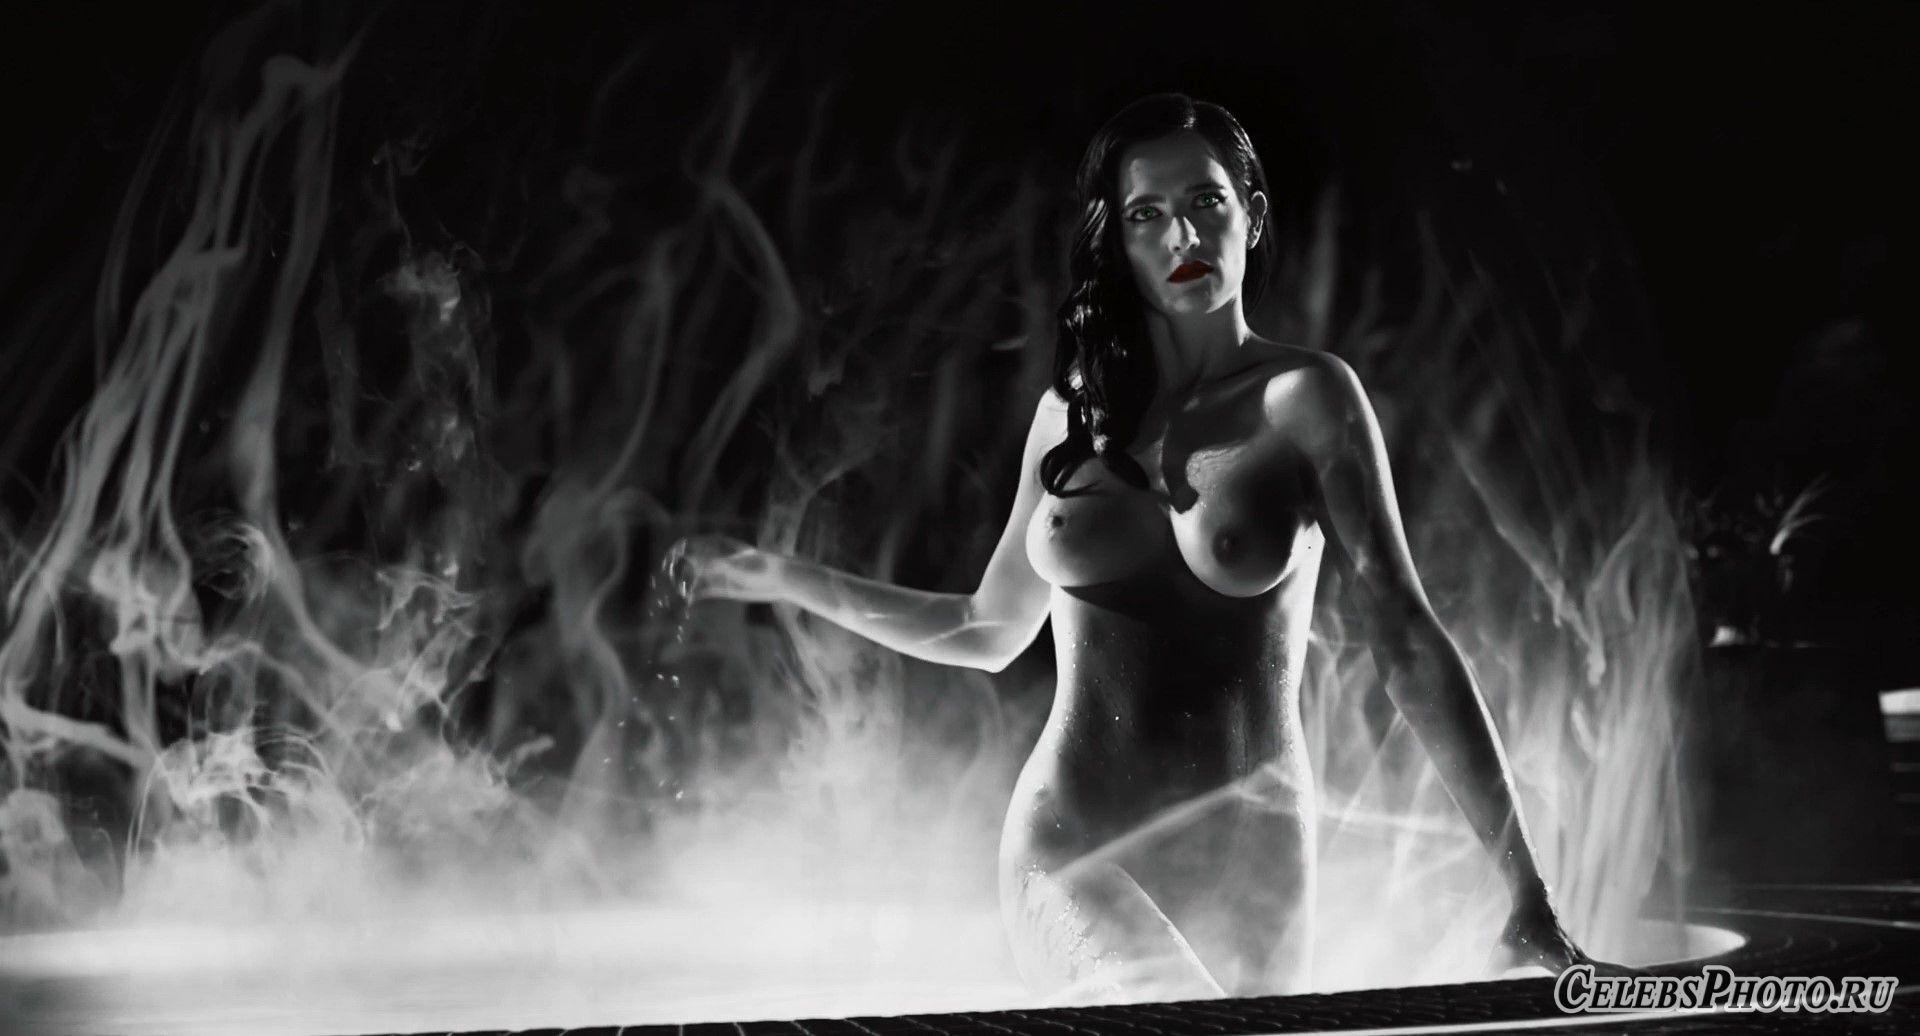 Naked girl in sin city, asian tiny tits